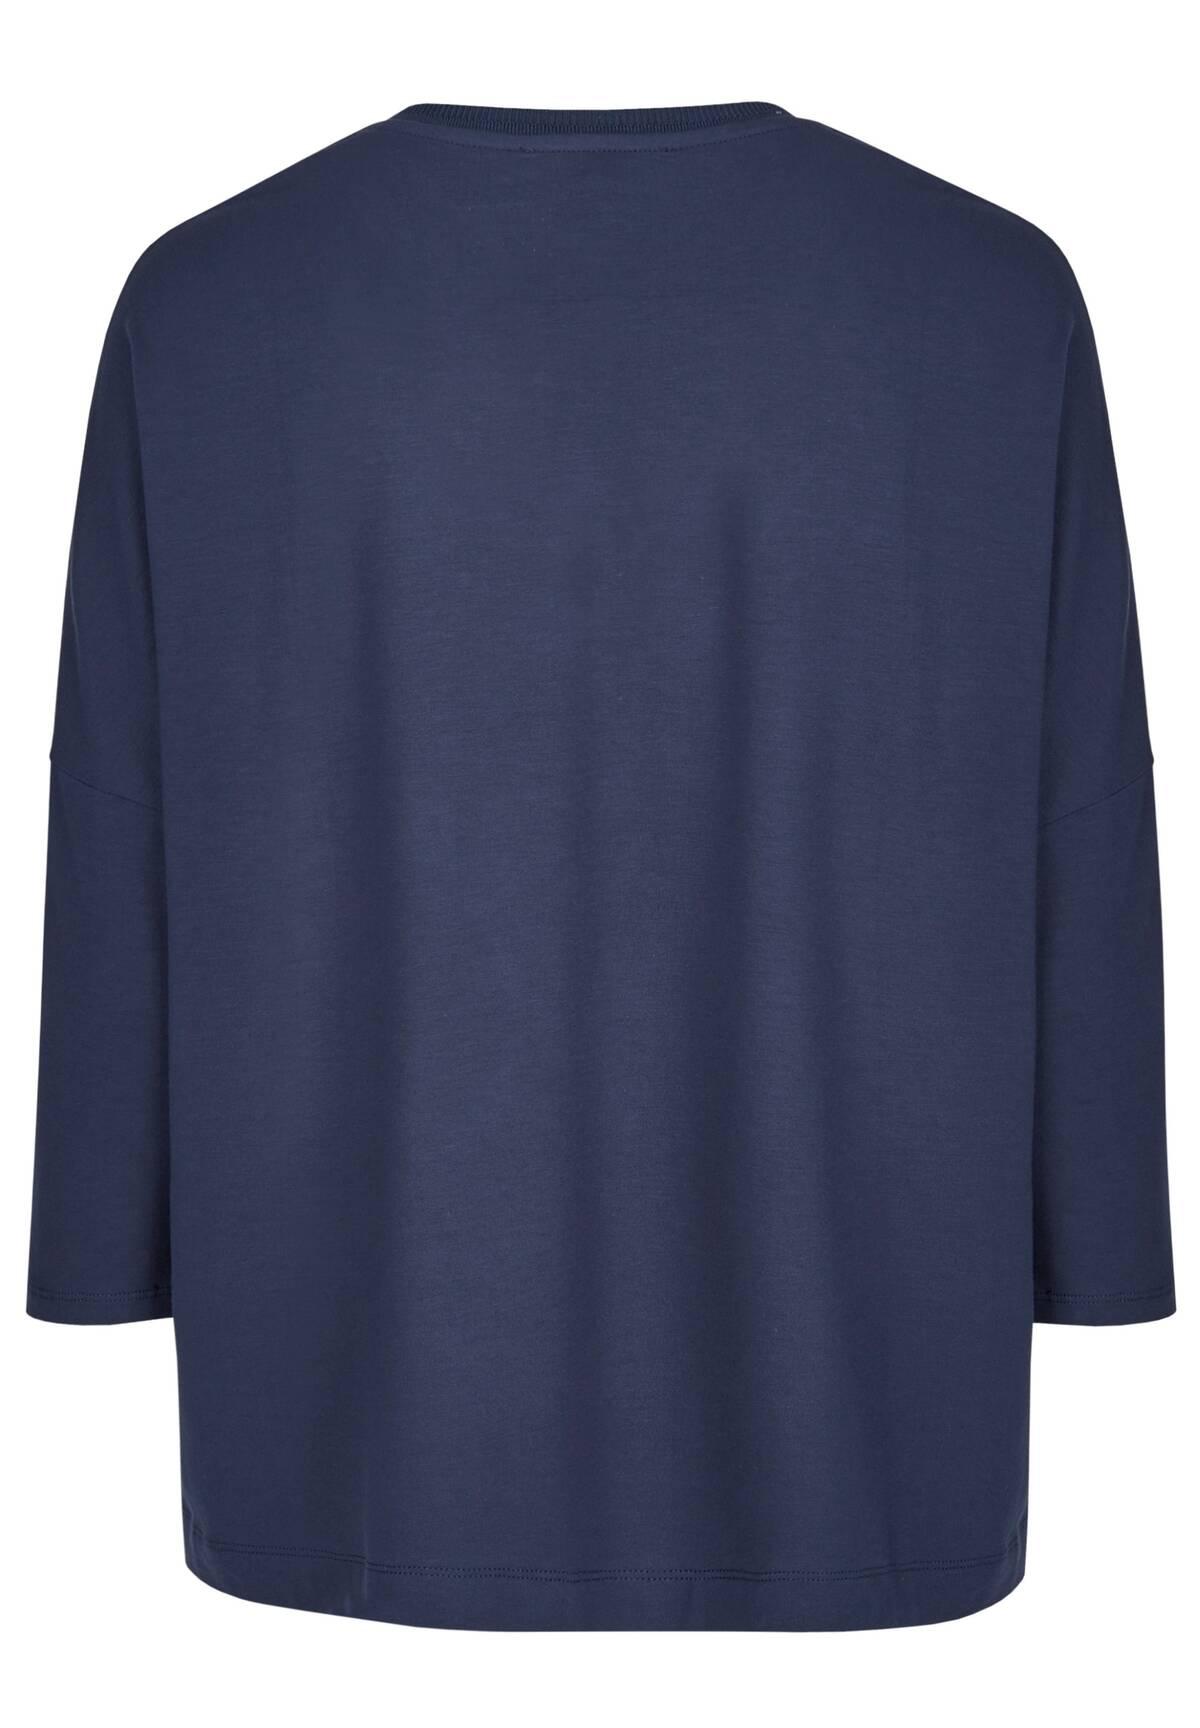 Moderner Pullover / V-Neck Shirt